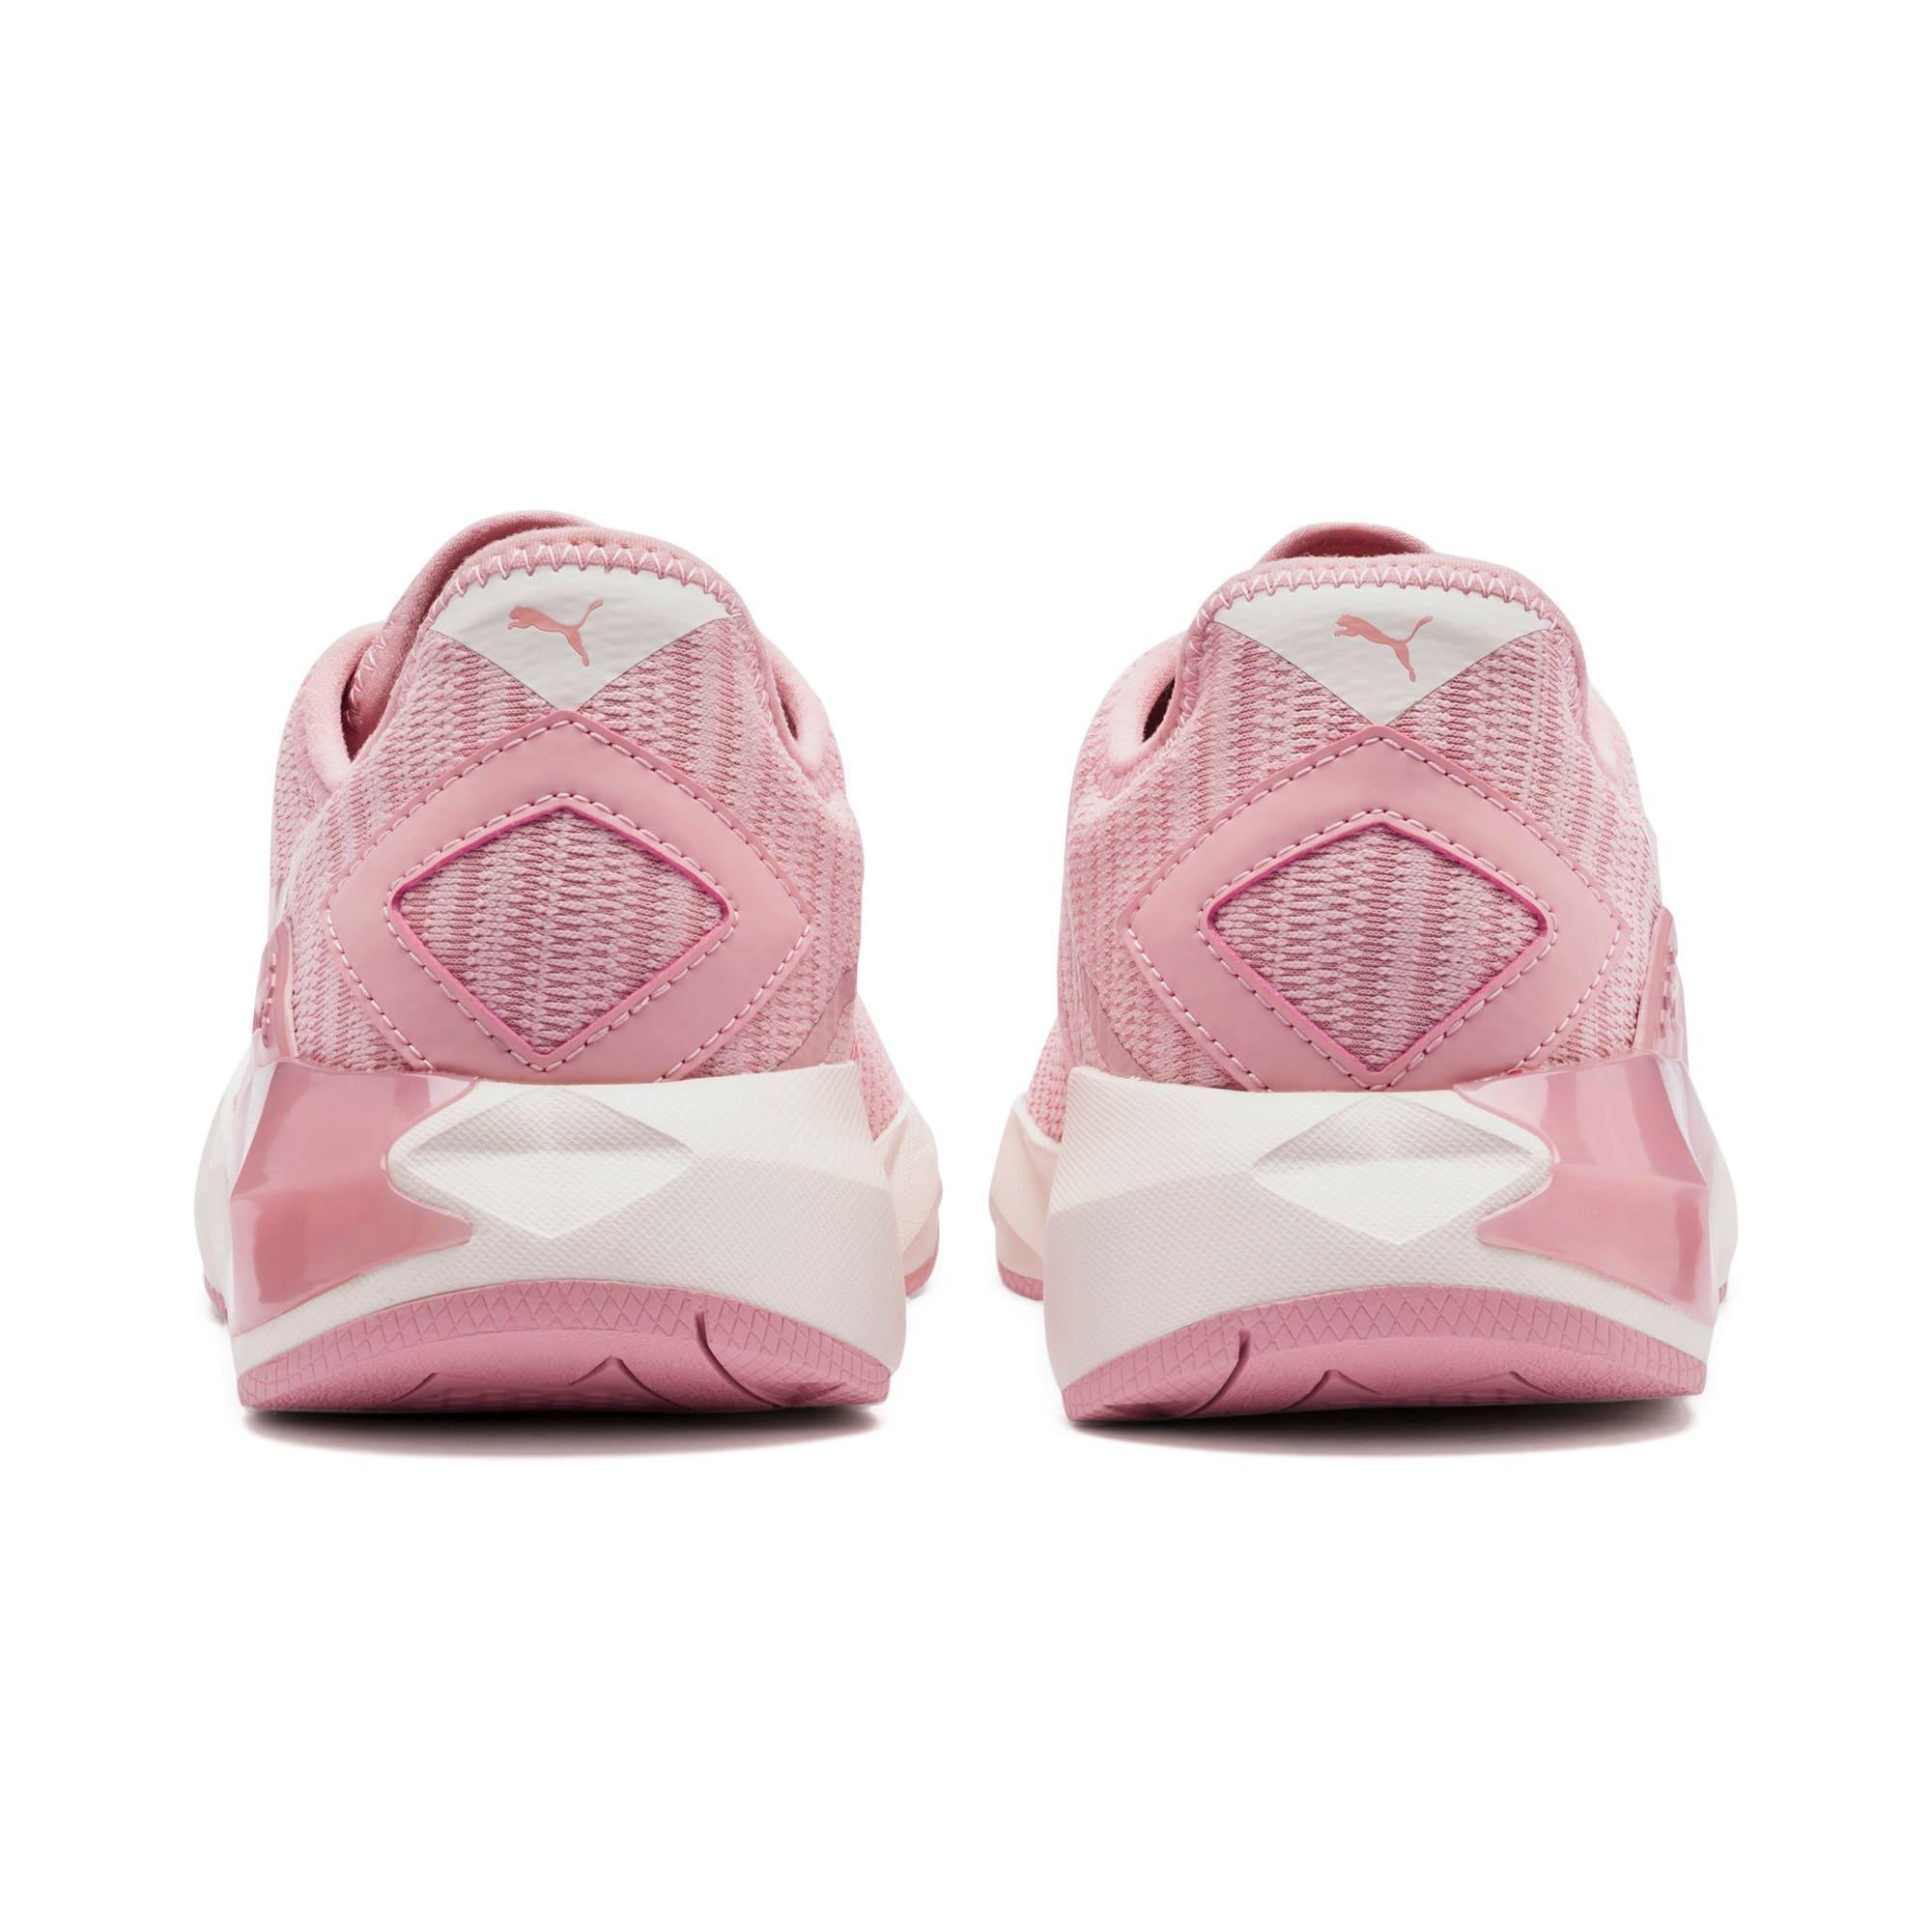 Thumbnail 4 of CELL Plasmic Women's Training Shoes, Bridal Rose-Pastel Parchment, medium